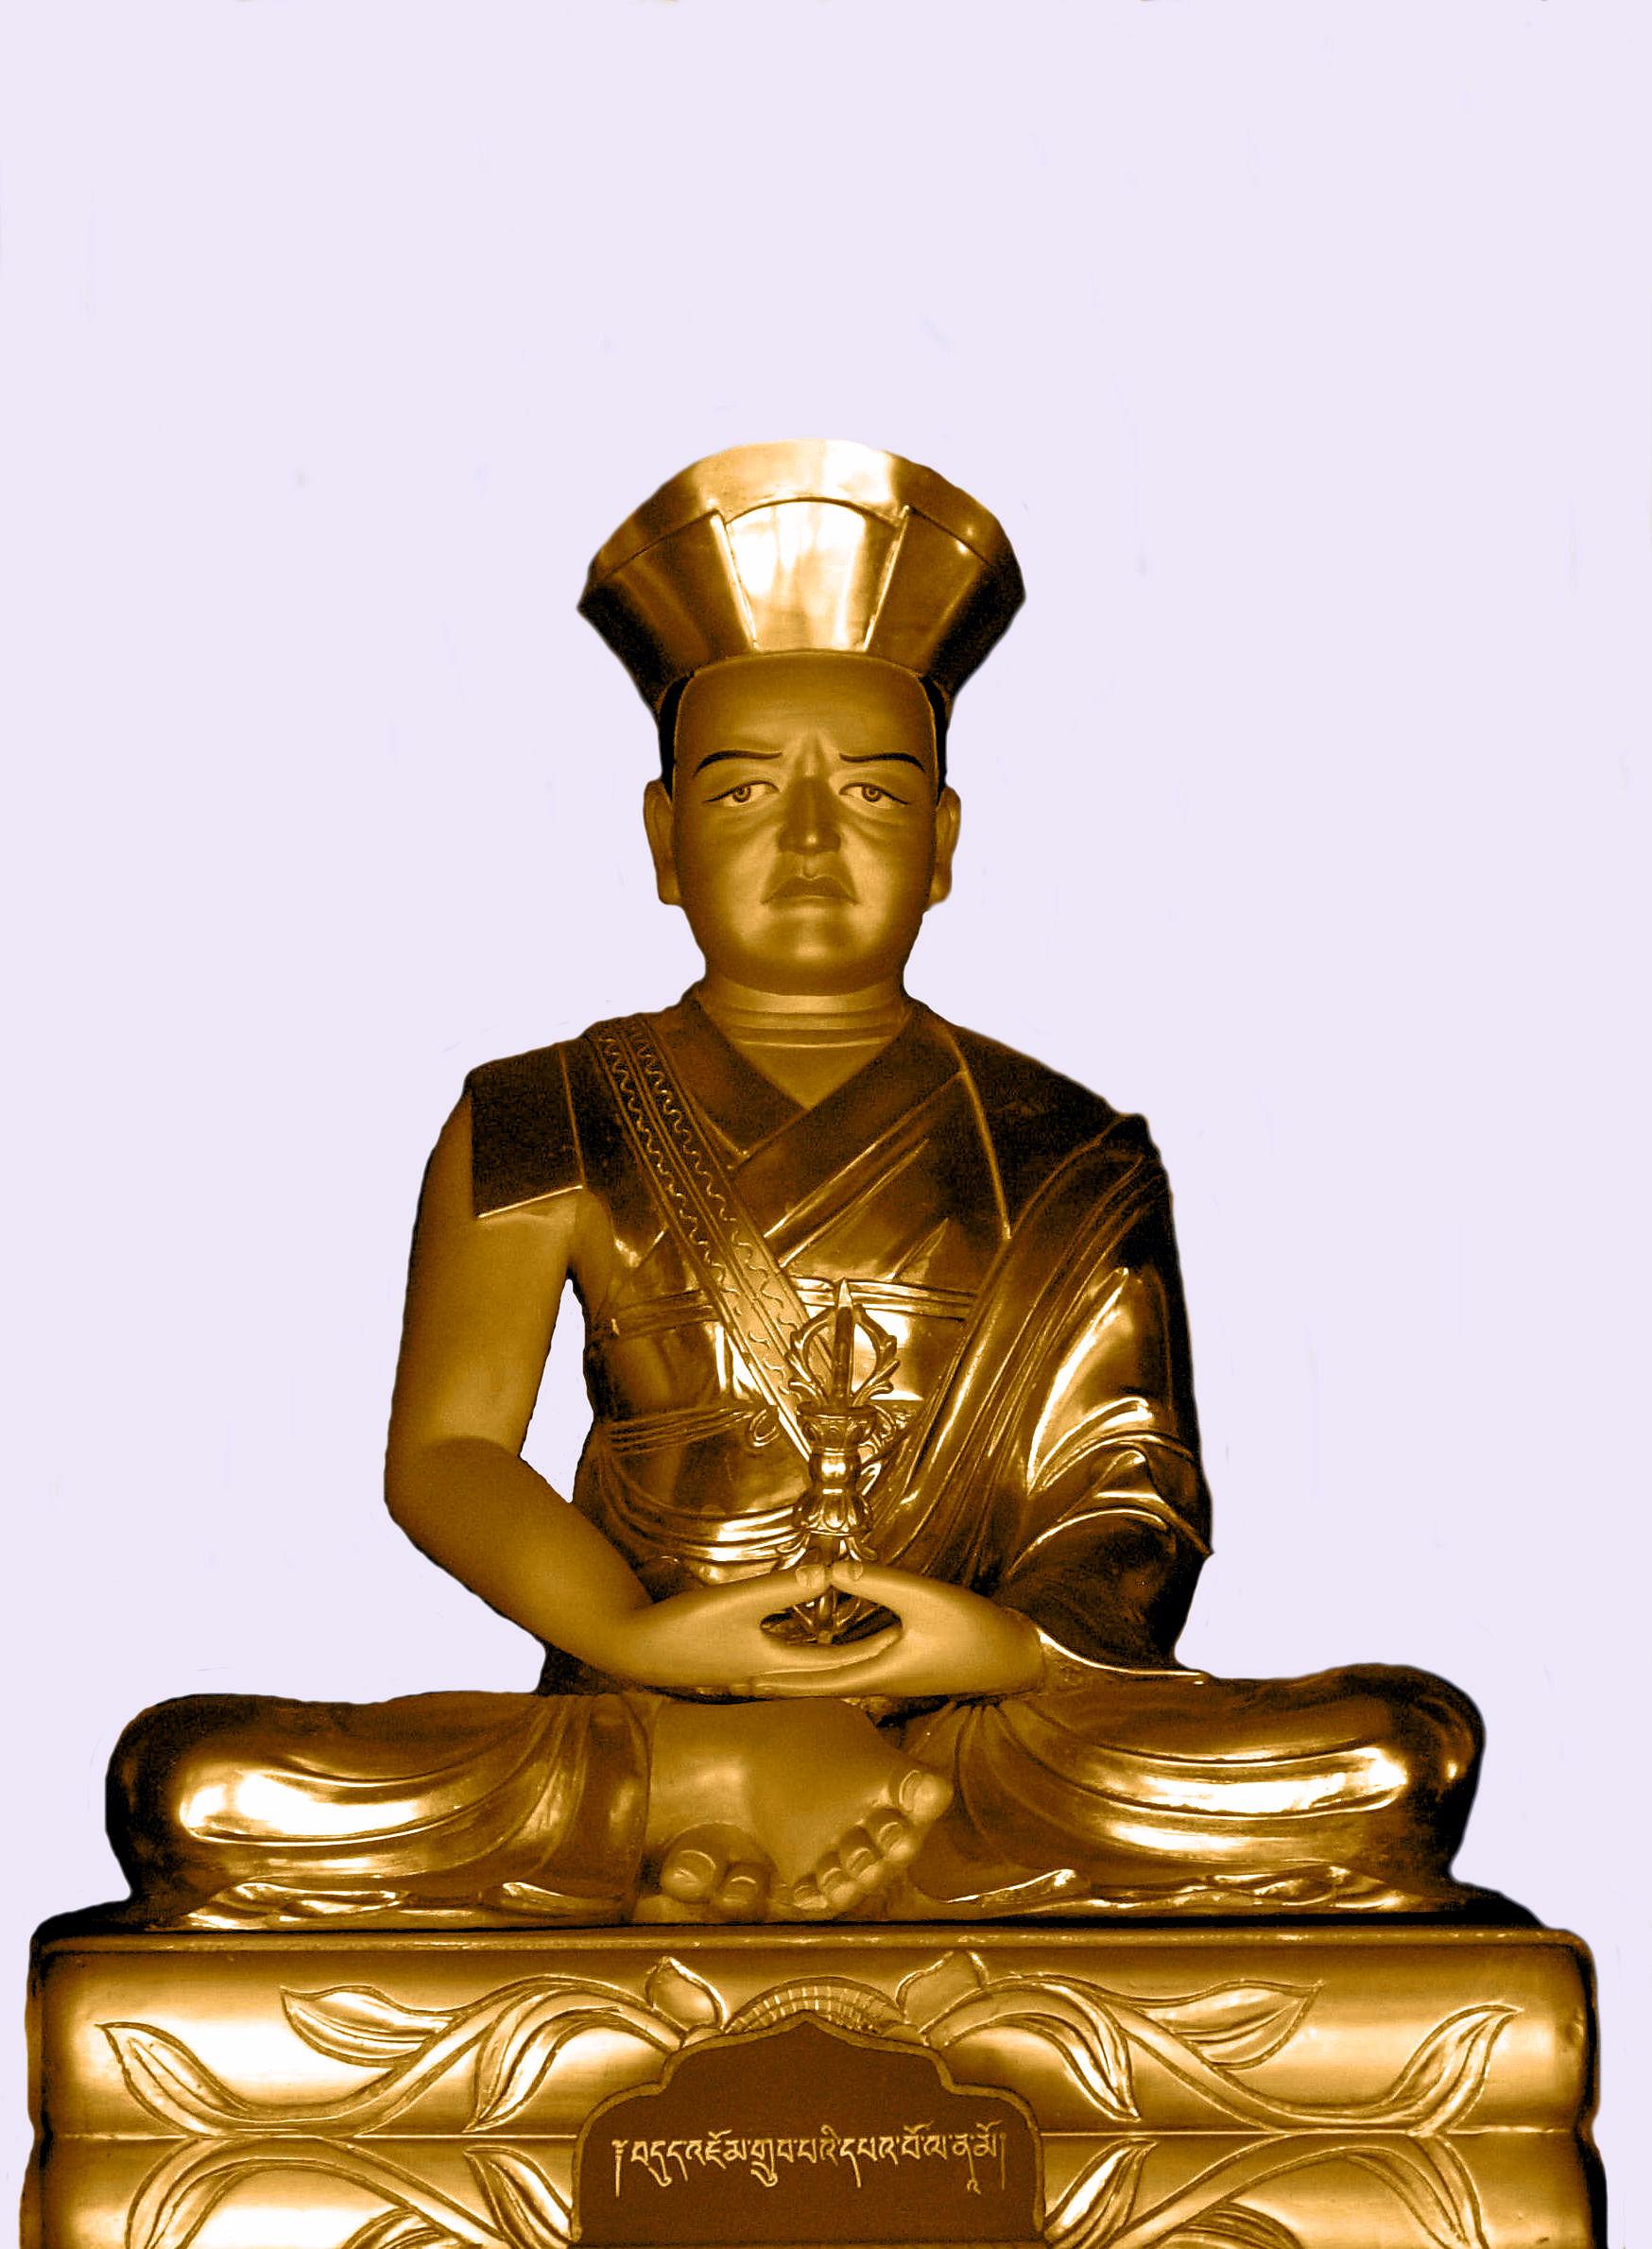 The 2nd Drukpa Choegon Rinpoche, Thubchen Dudjom Dorje